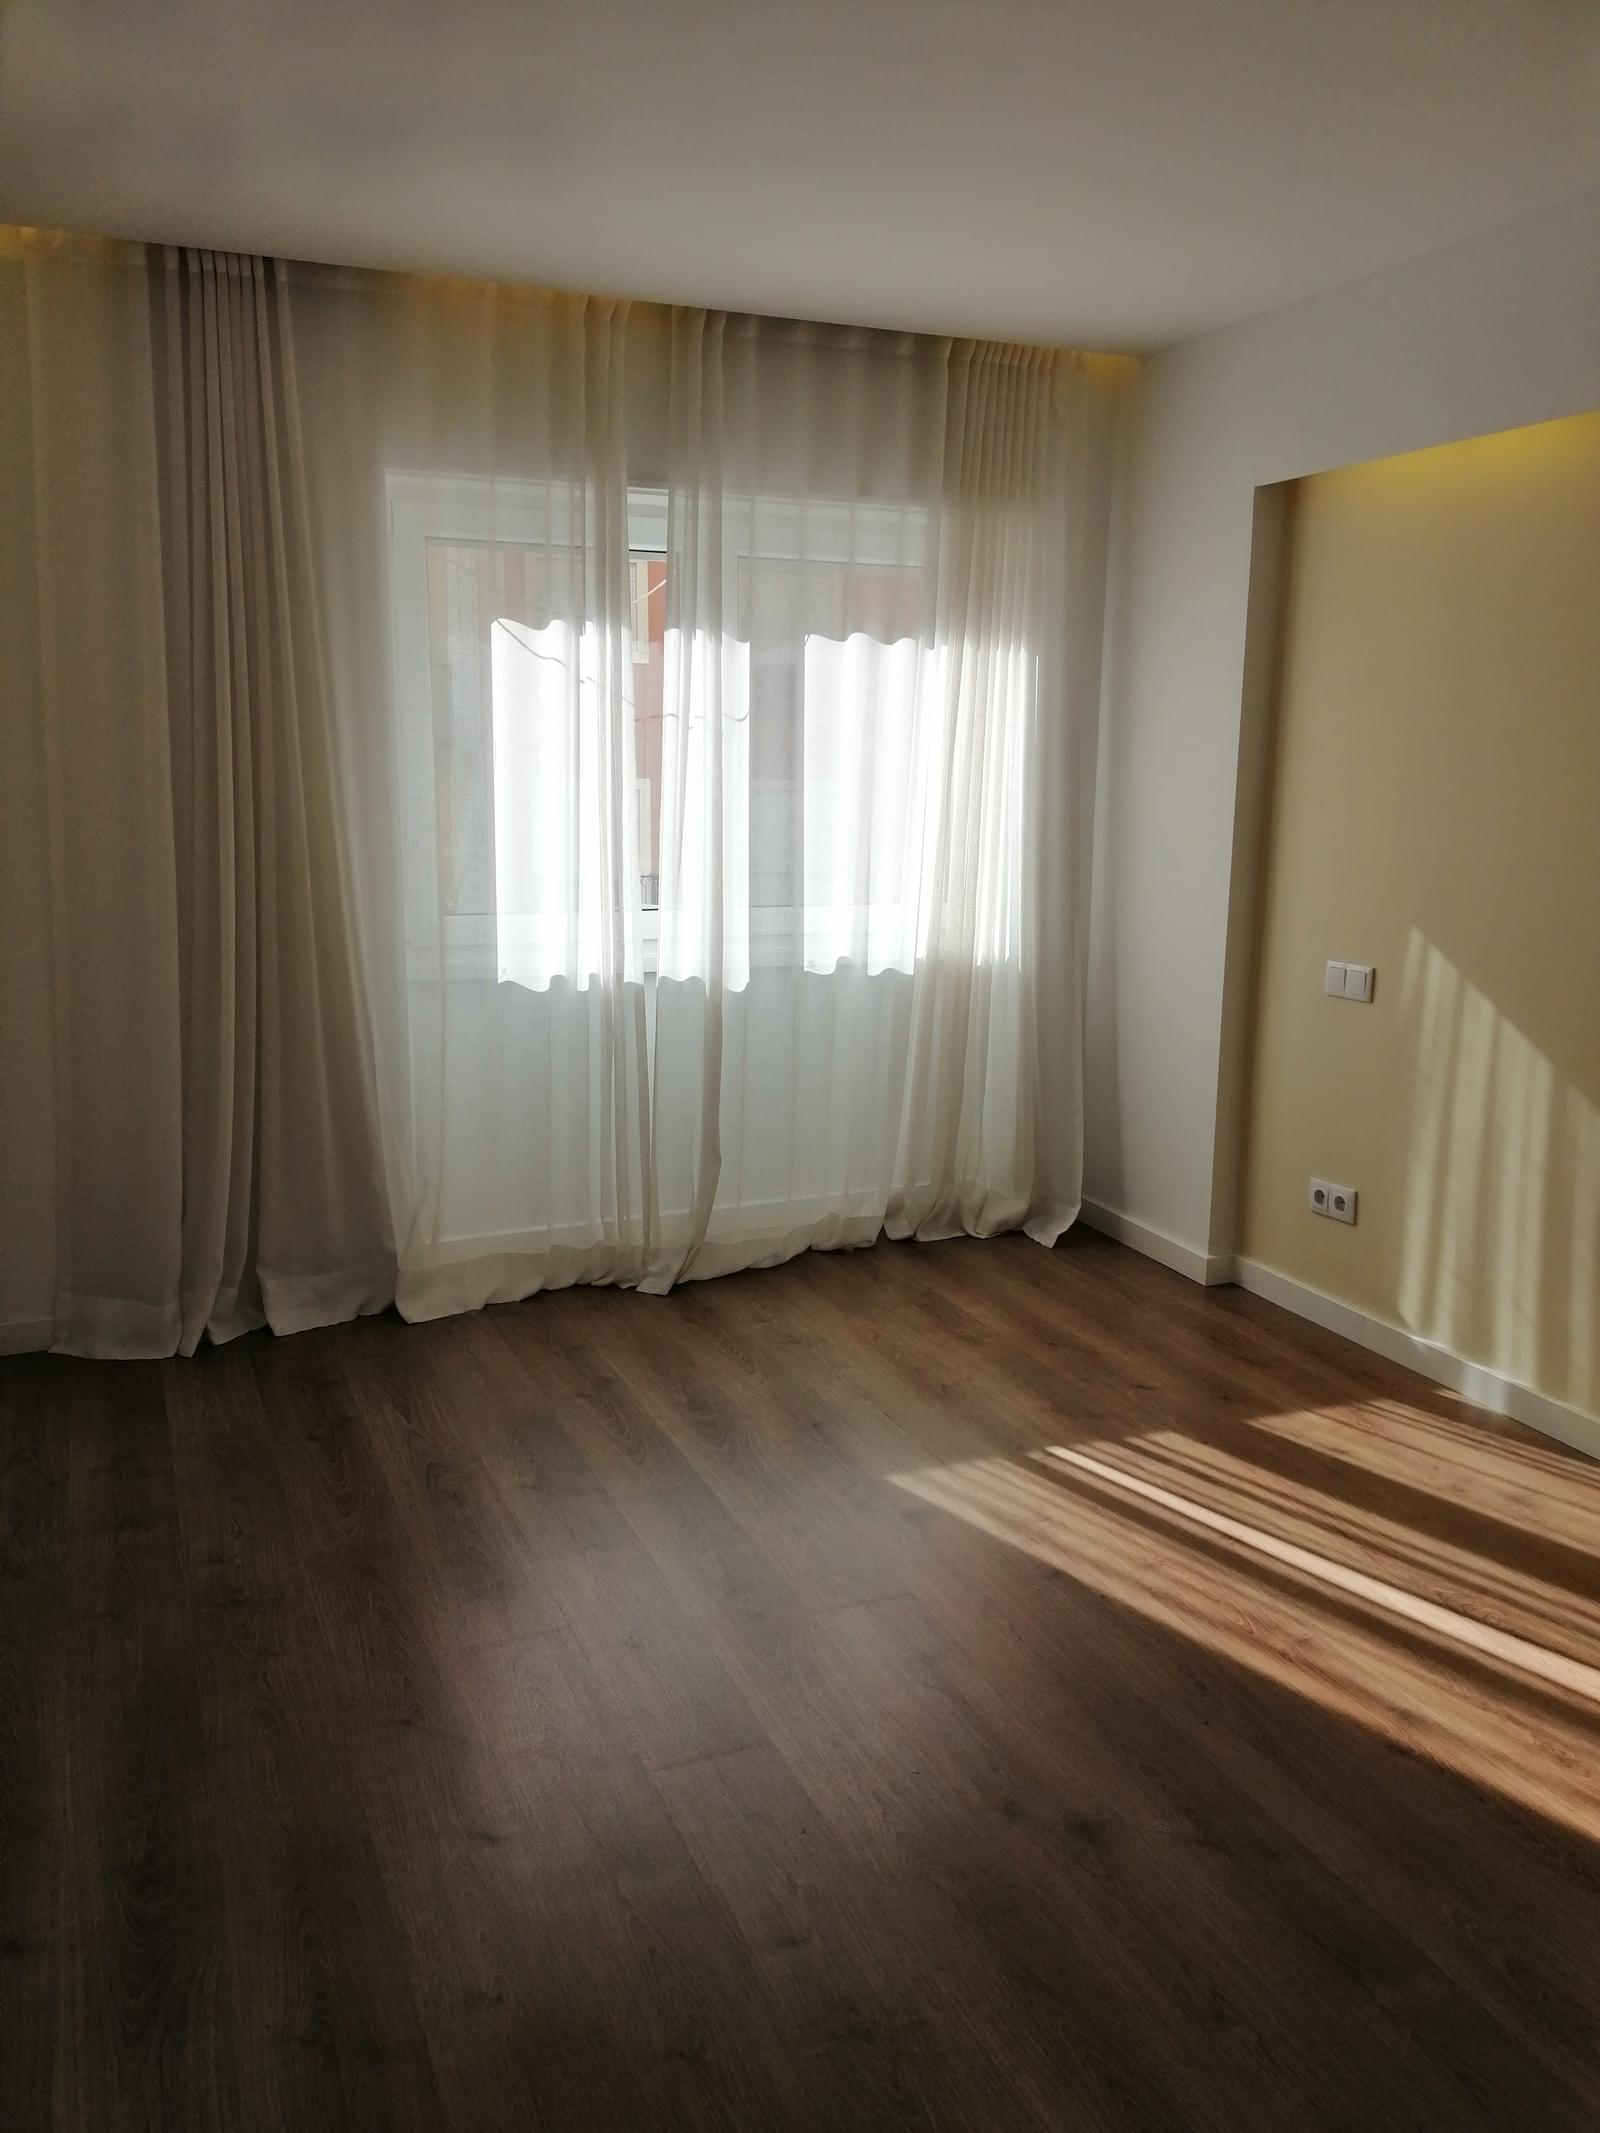 pf18996-apartamento-t3-lisboa-12863157-e345-4401-8e55-9d46575c5a7d